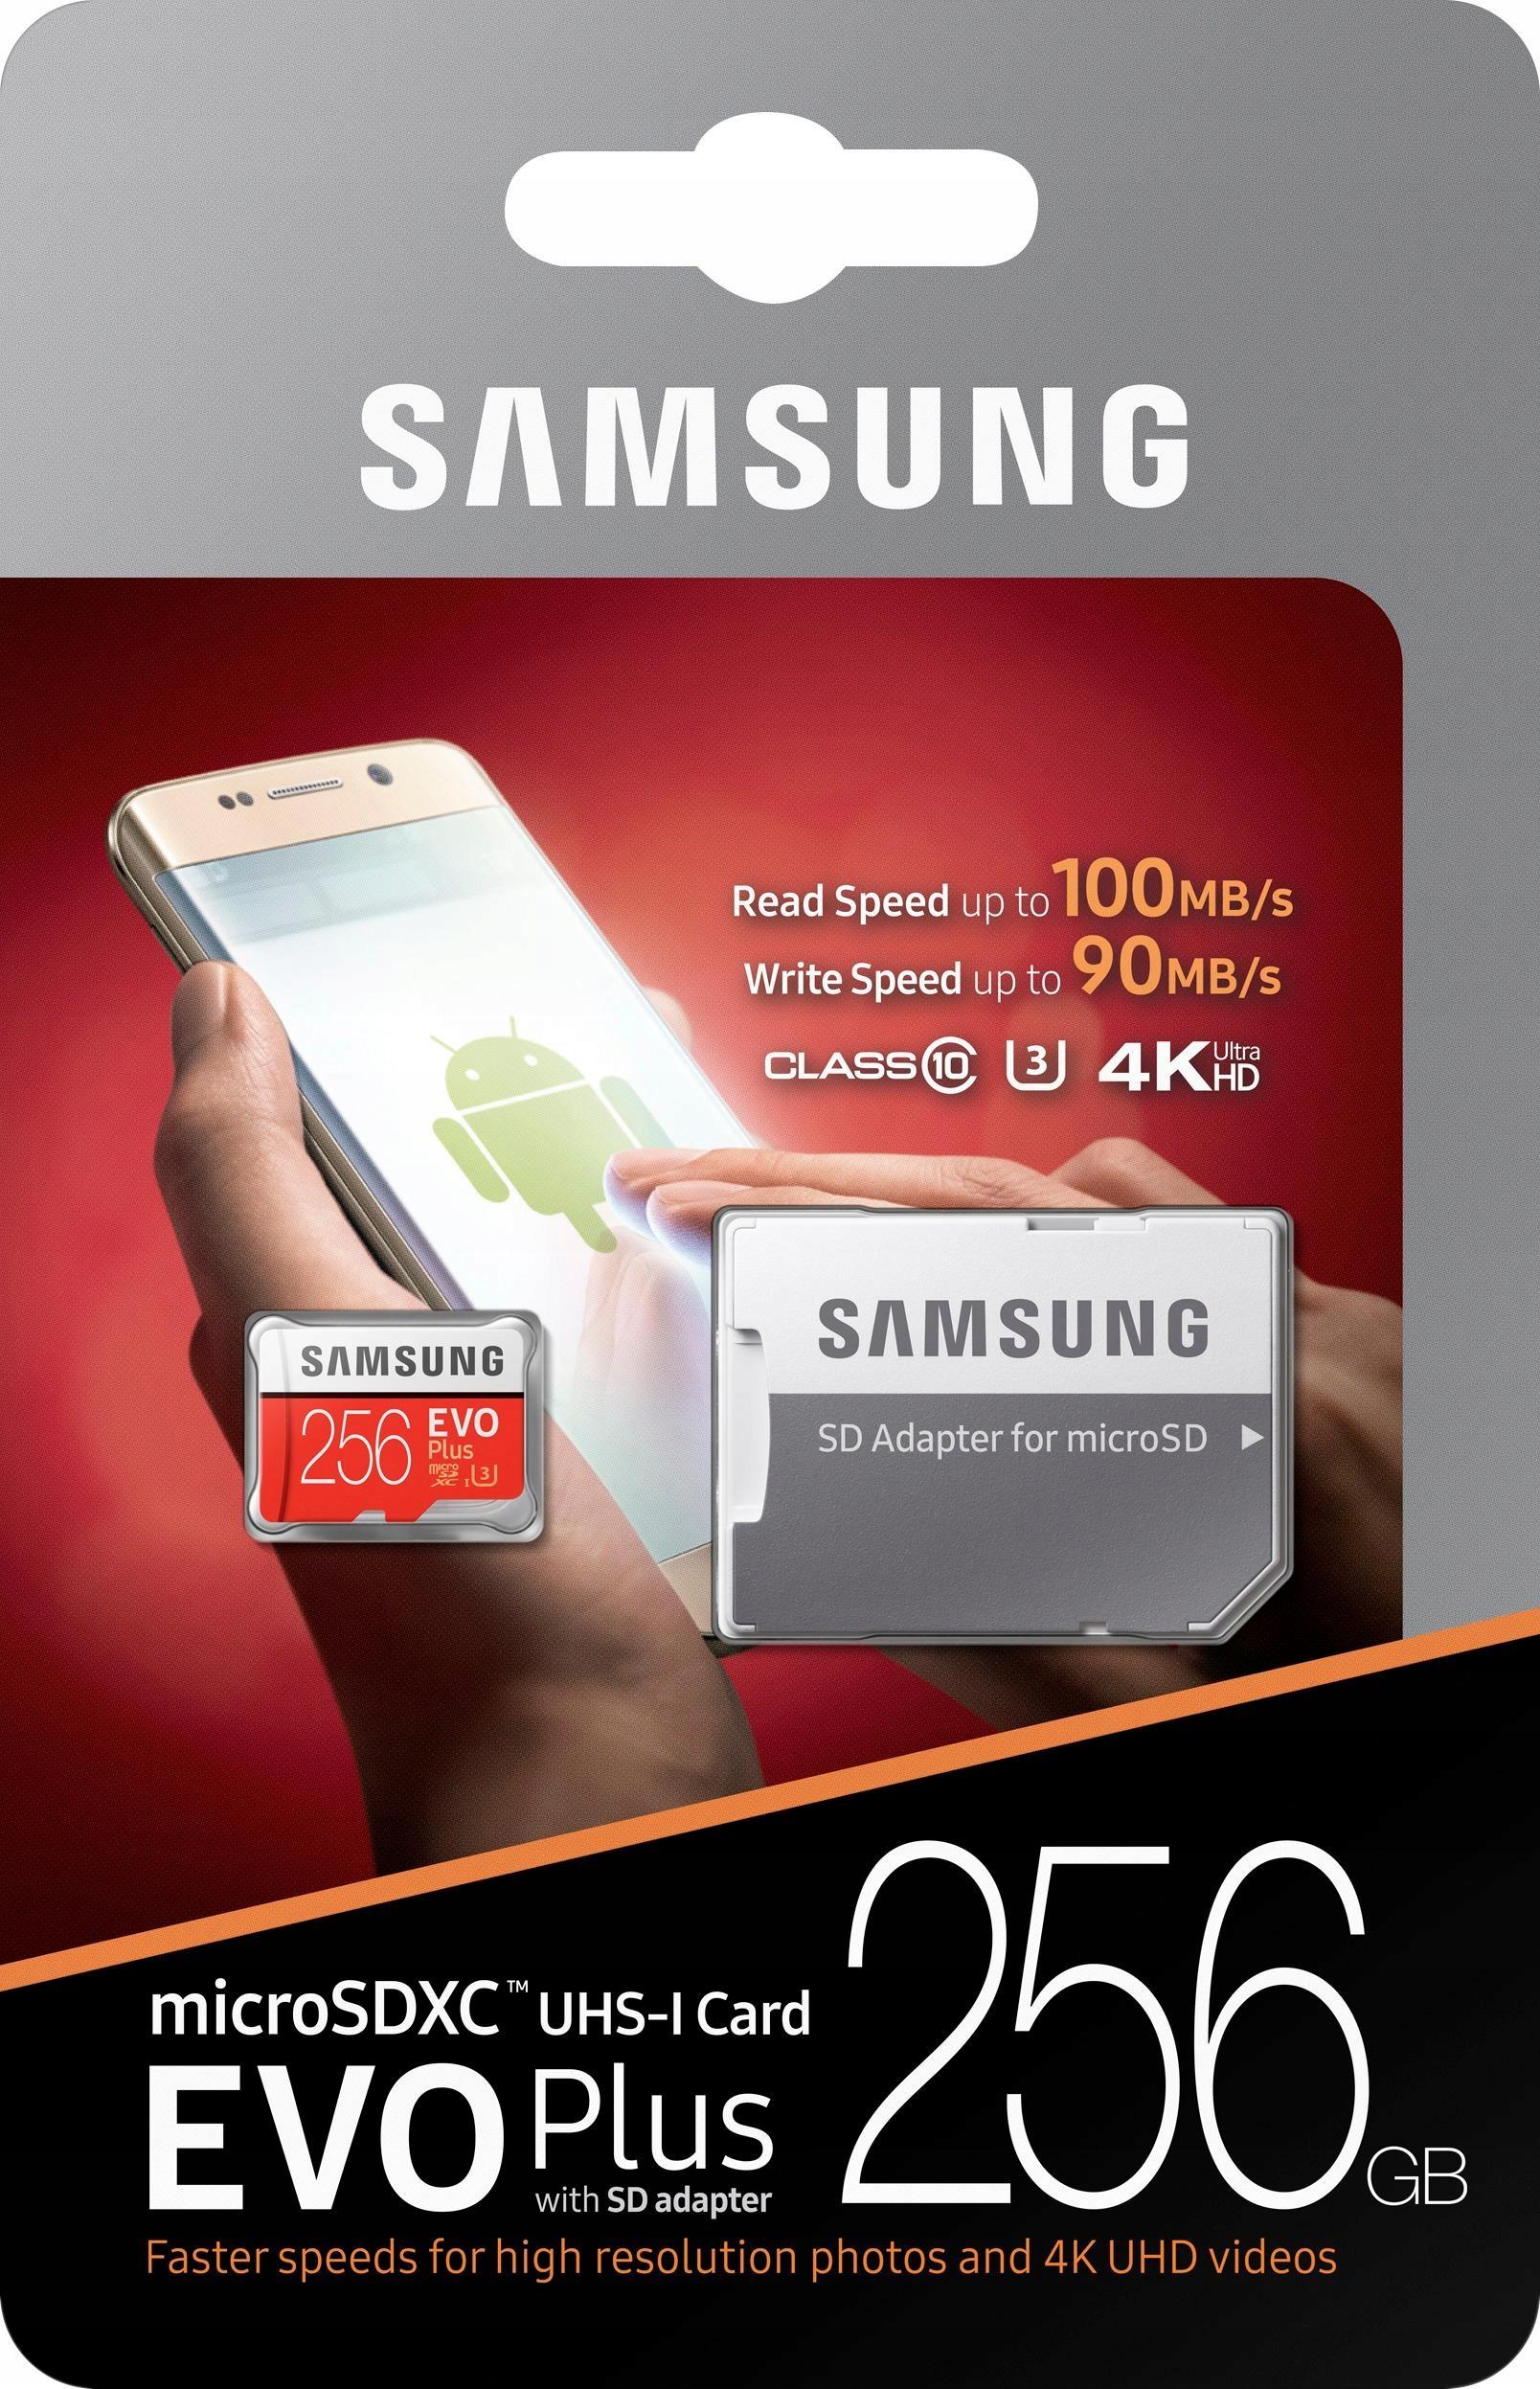 Item SAMSUNG MEMORY CARD MICRO SD XC EVO+ U3 256GB